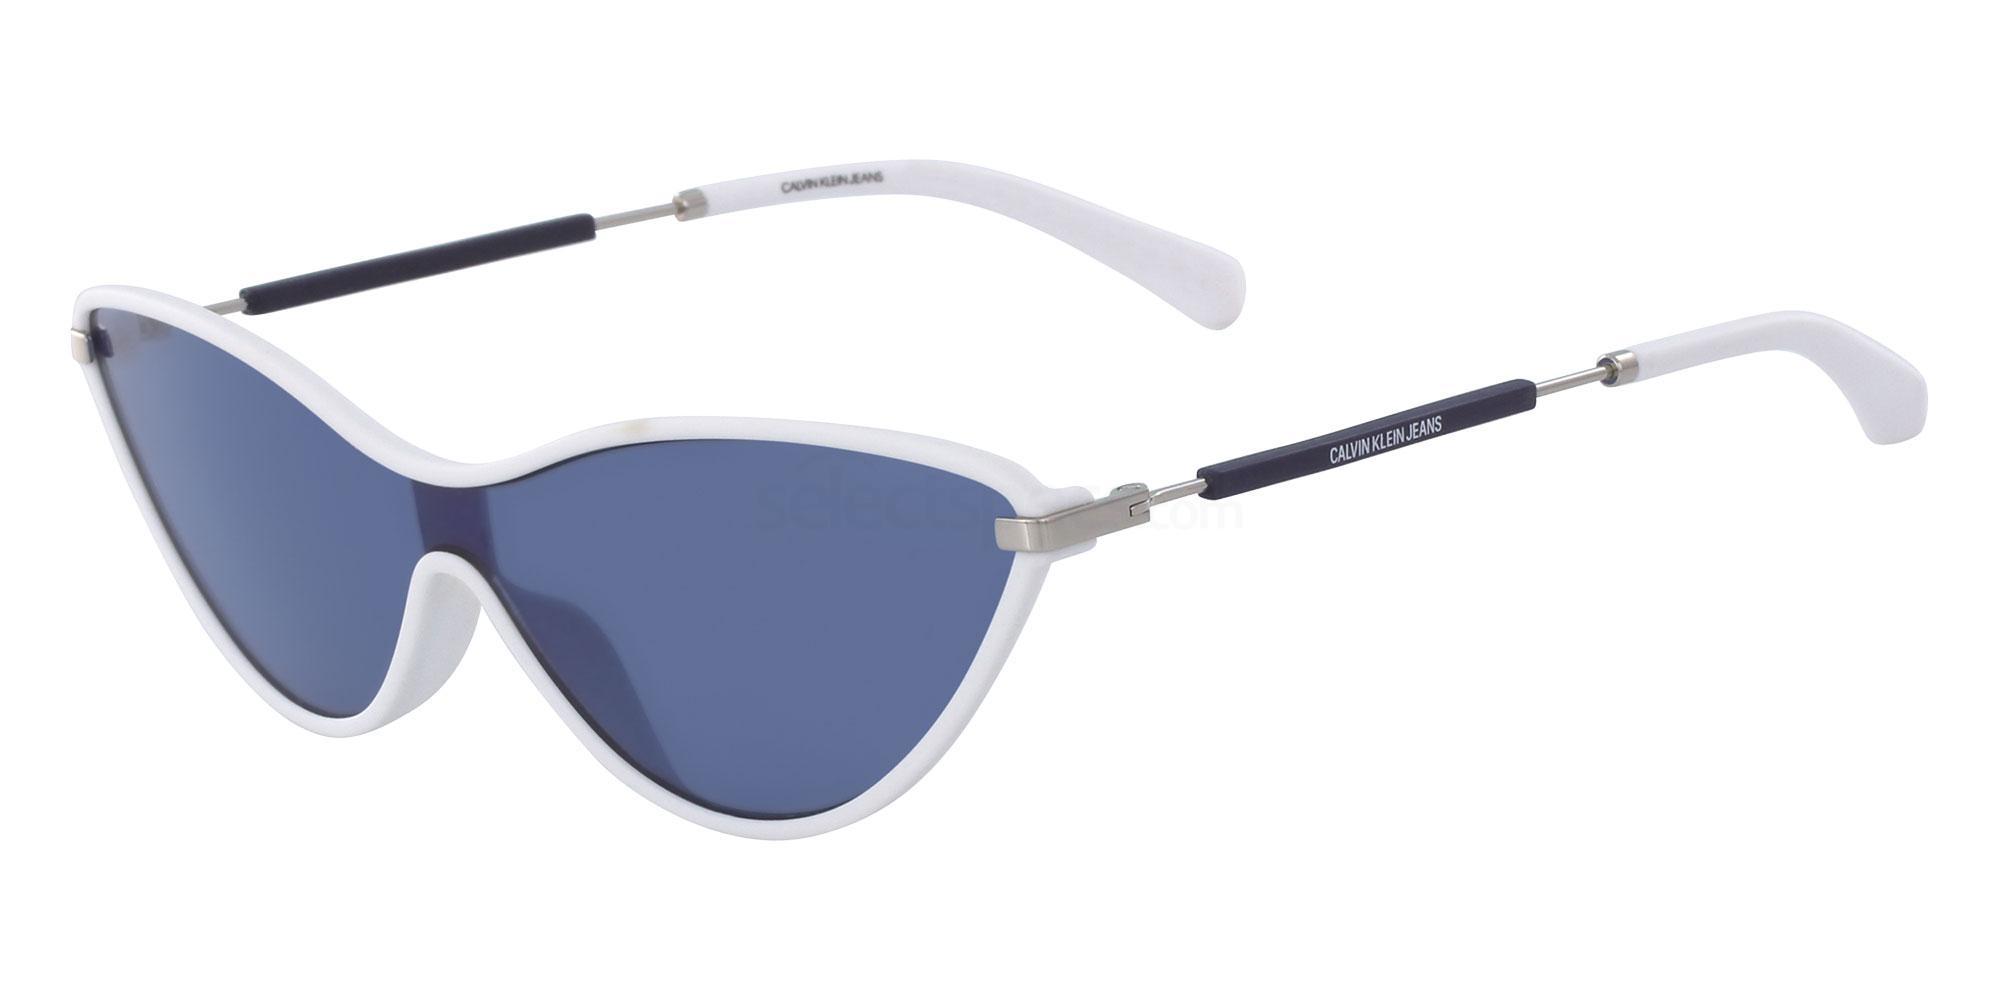 olivia culpo sunglasses style steal